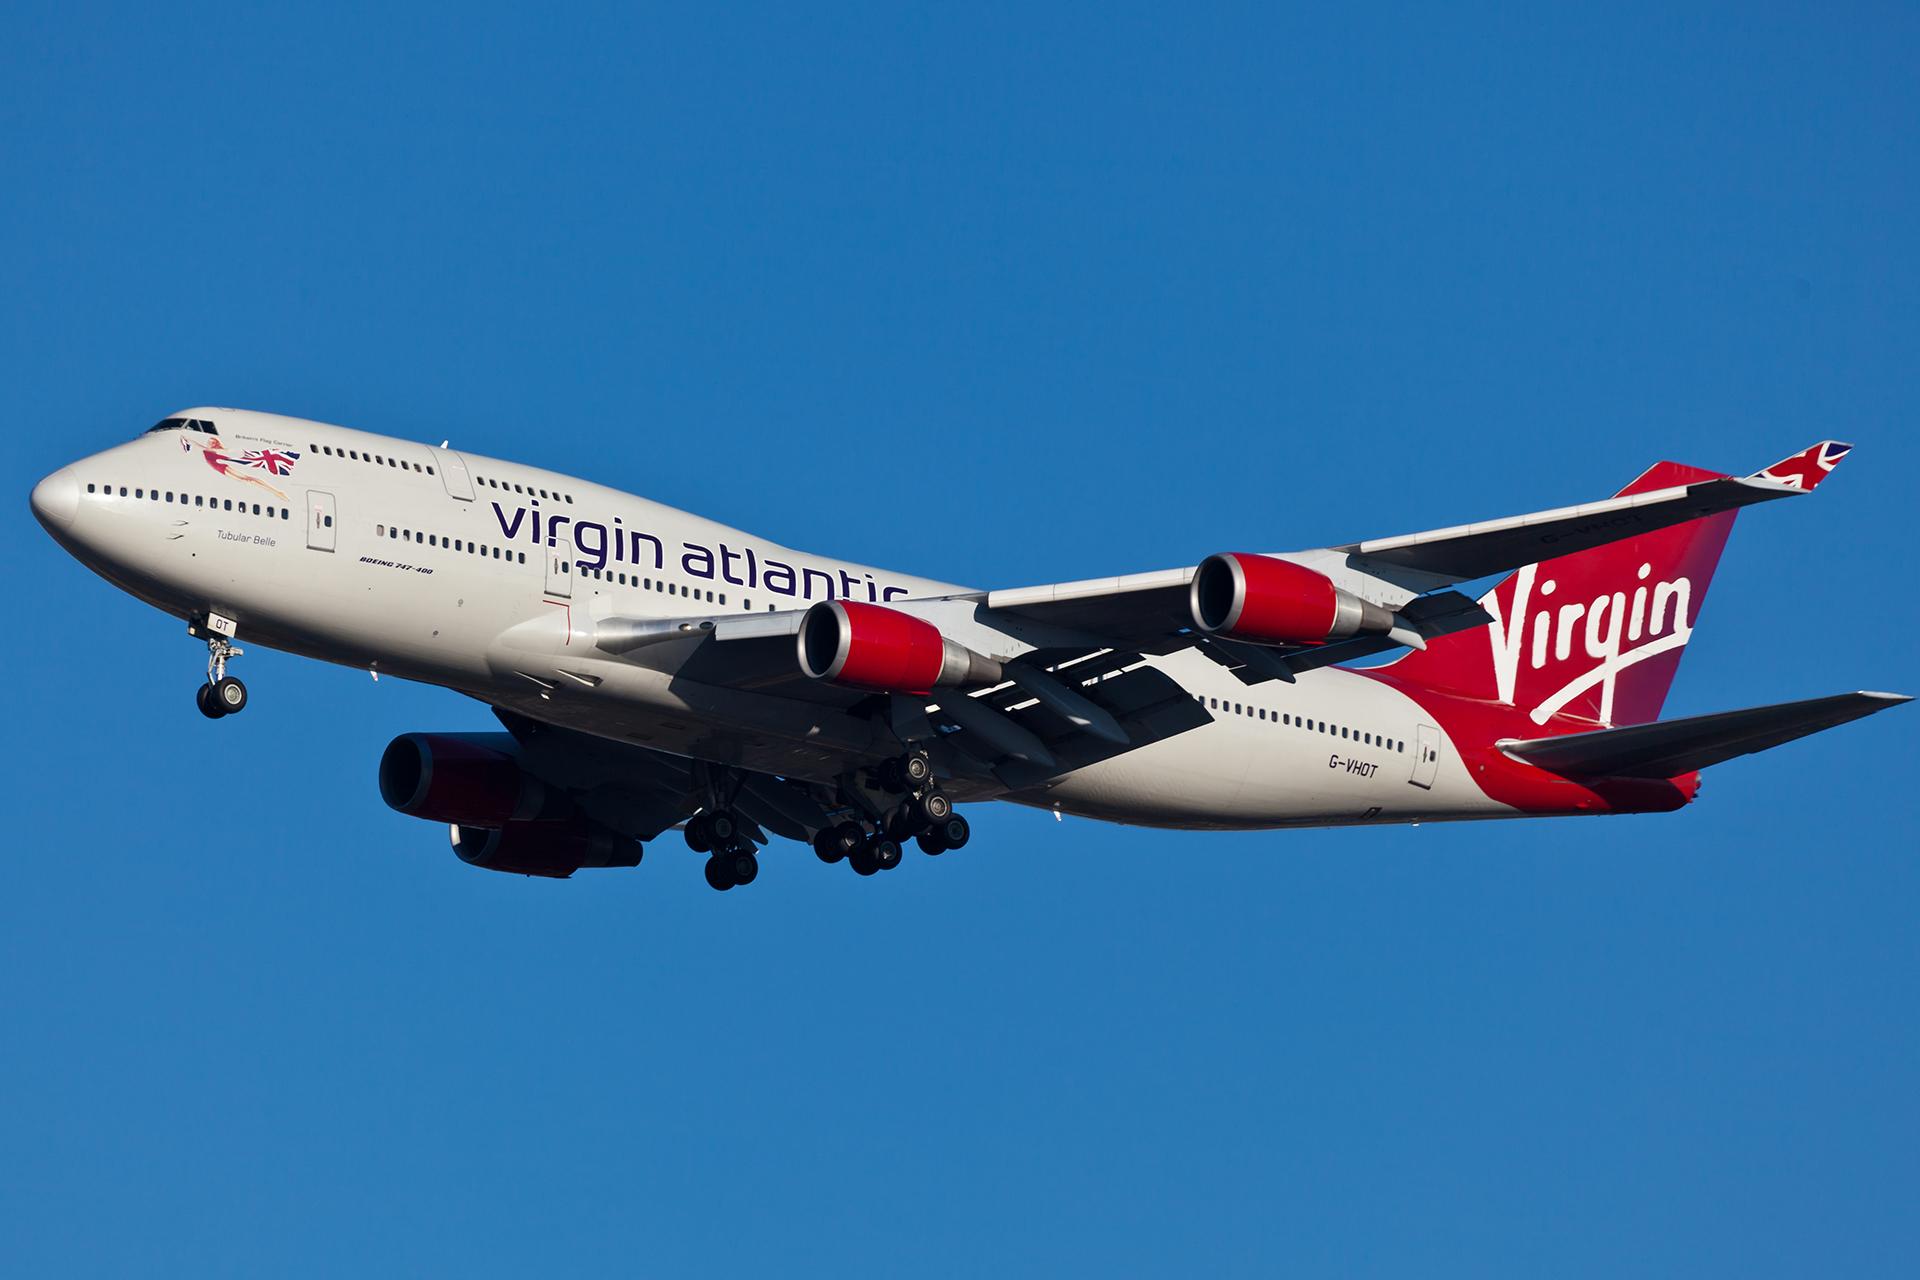 Virgin Atlantic launches WestJet codeshare partnership